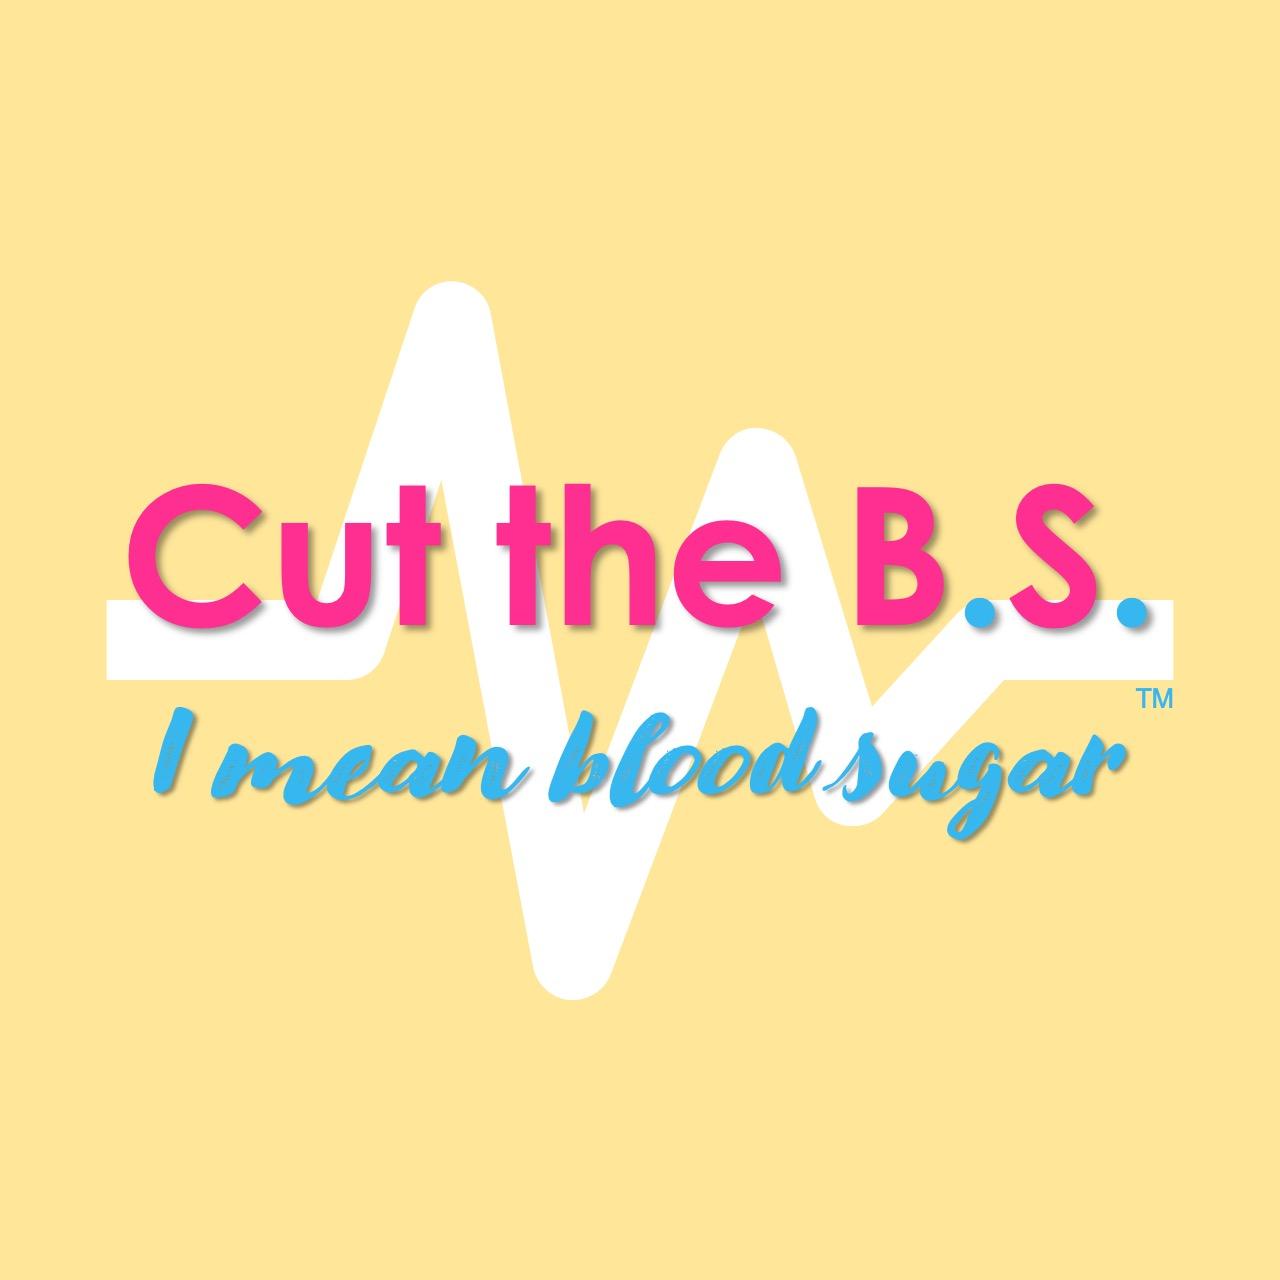 Cut the B.S.